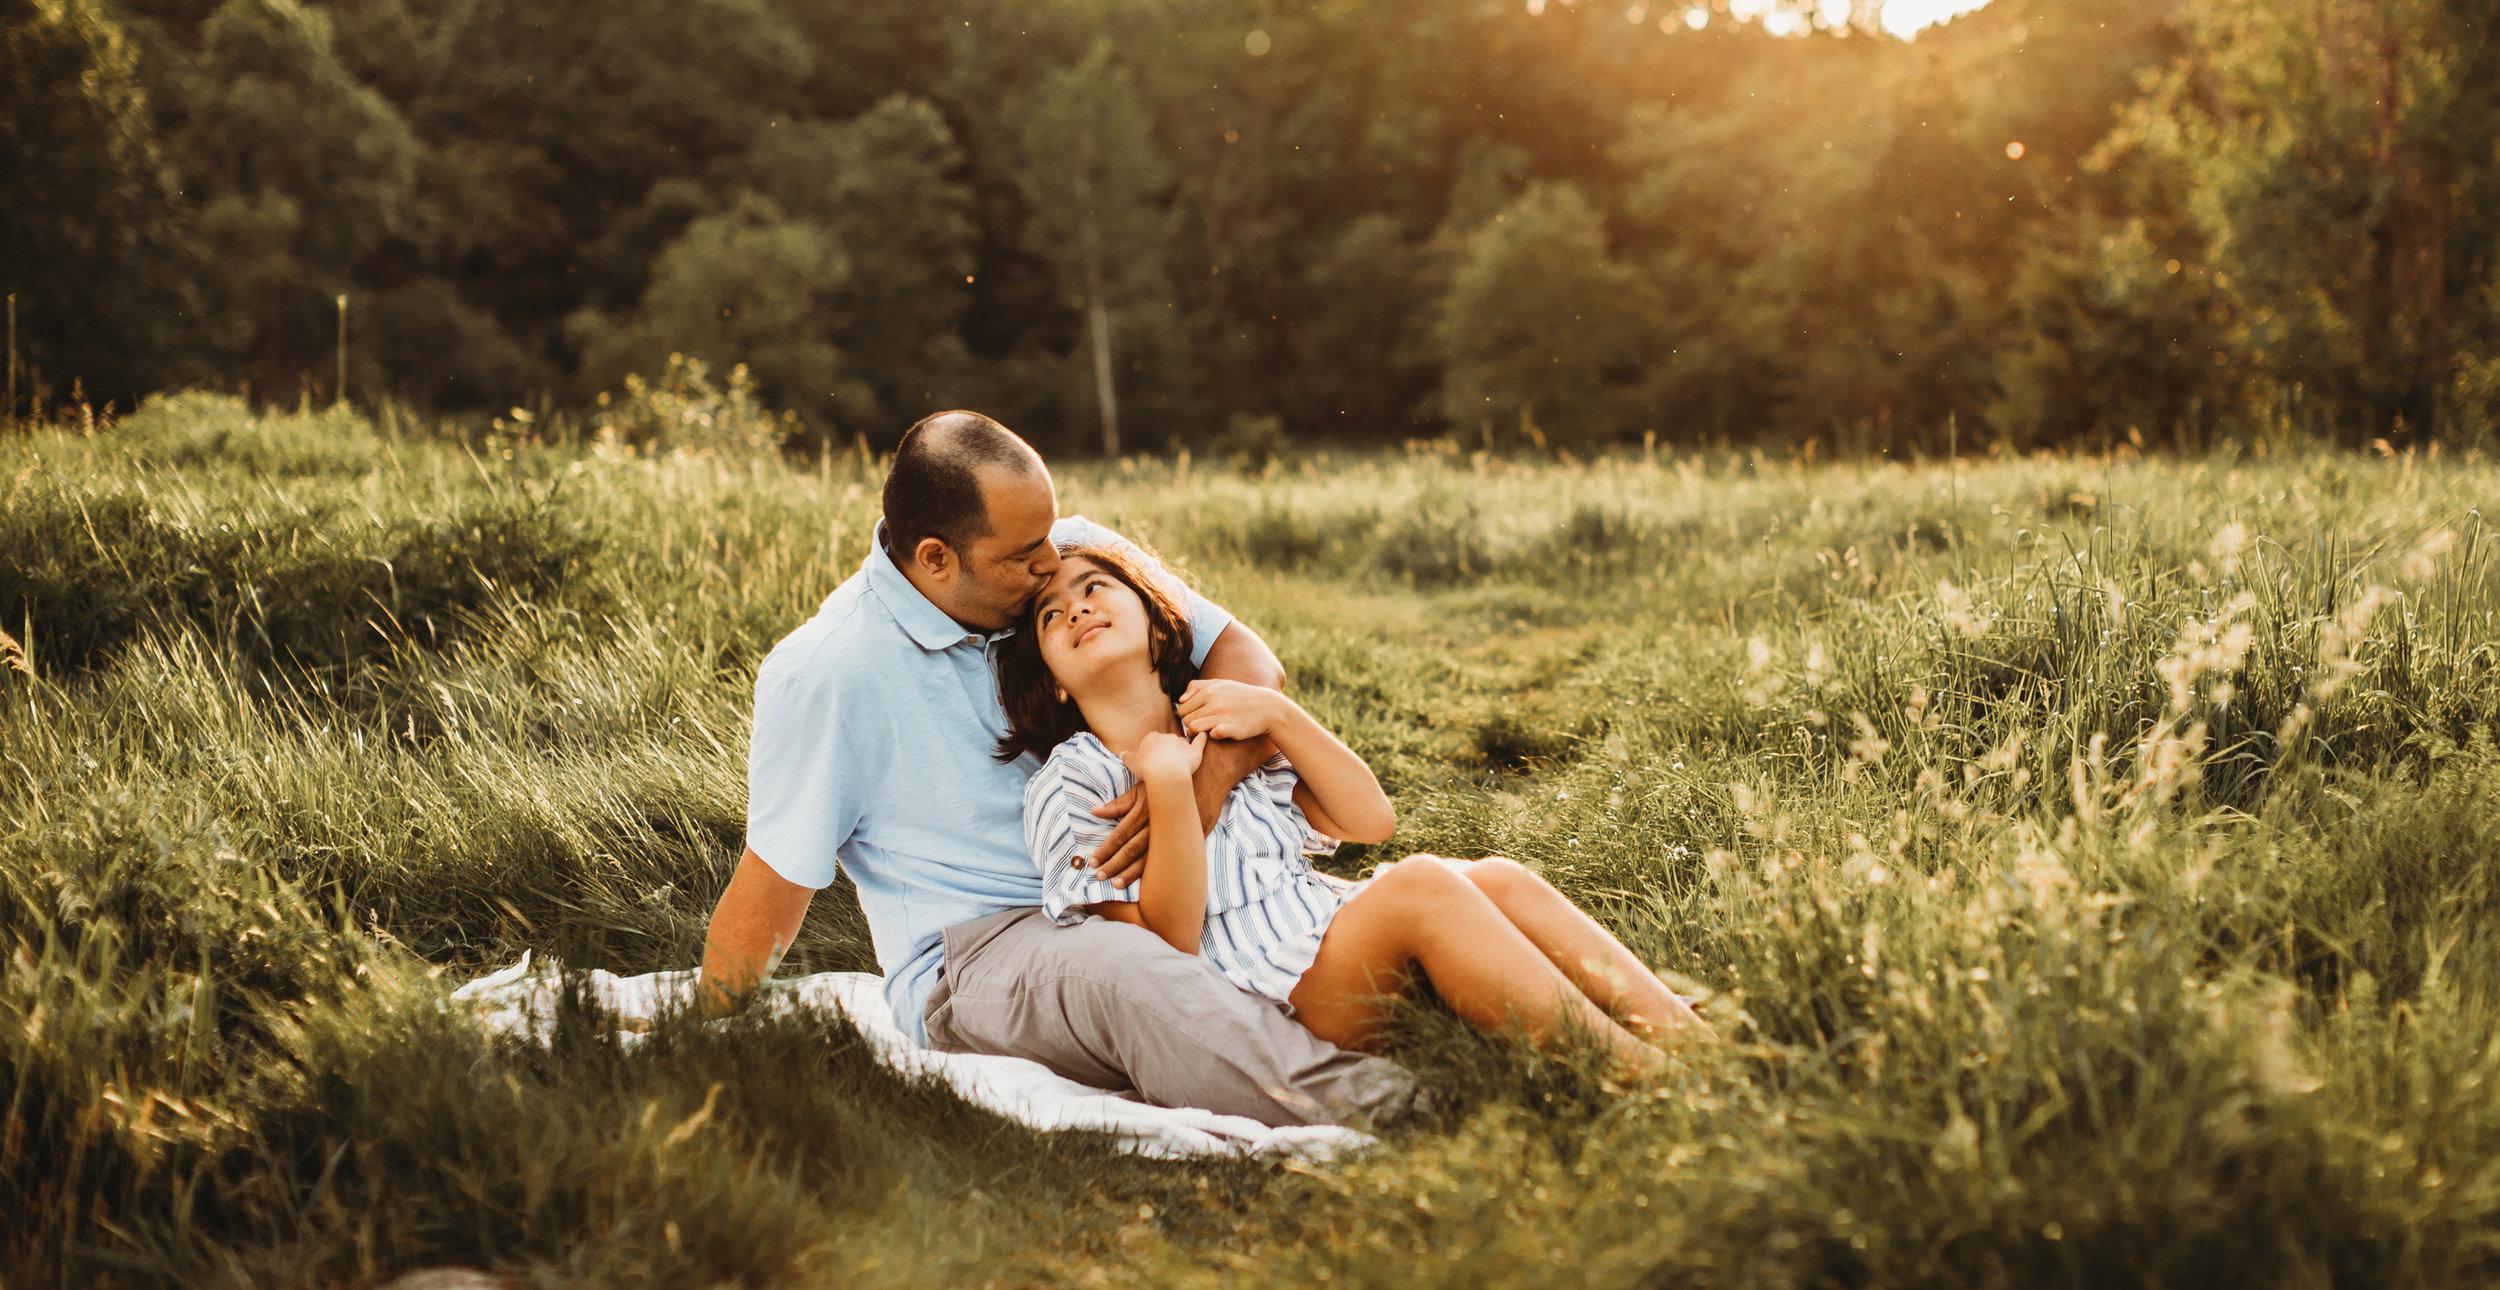 joyleducphotography-bostonfamilyphotography-homepage-1.jpg